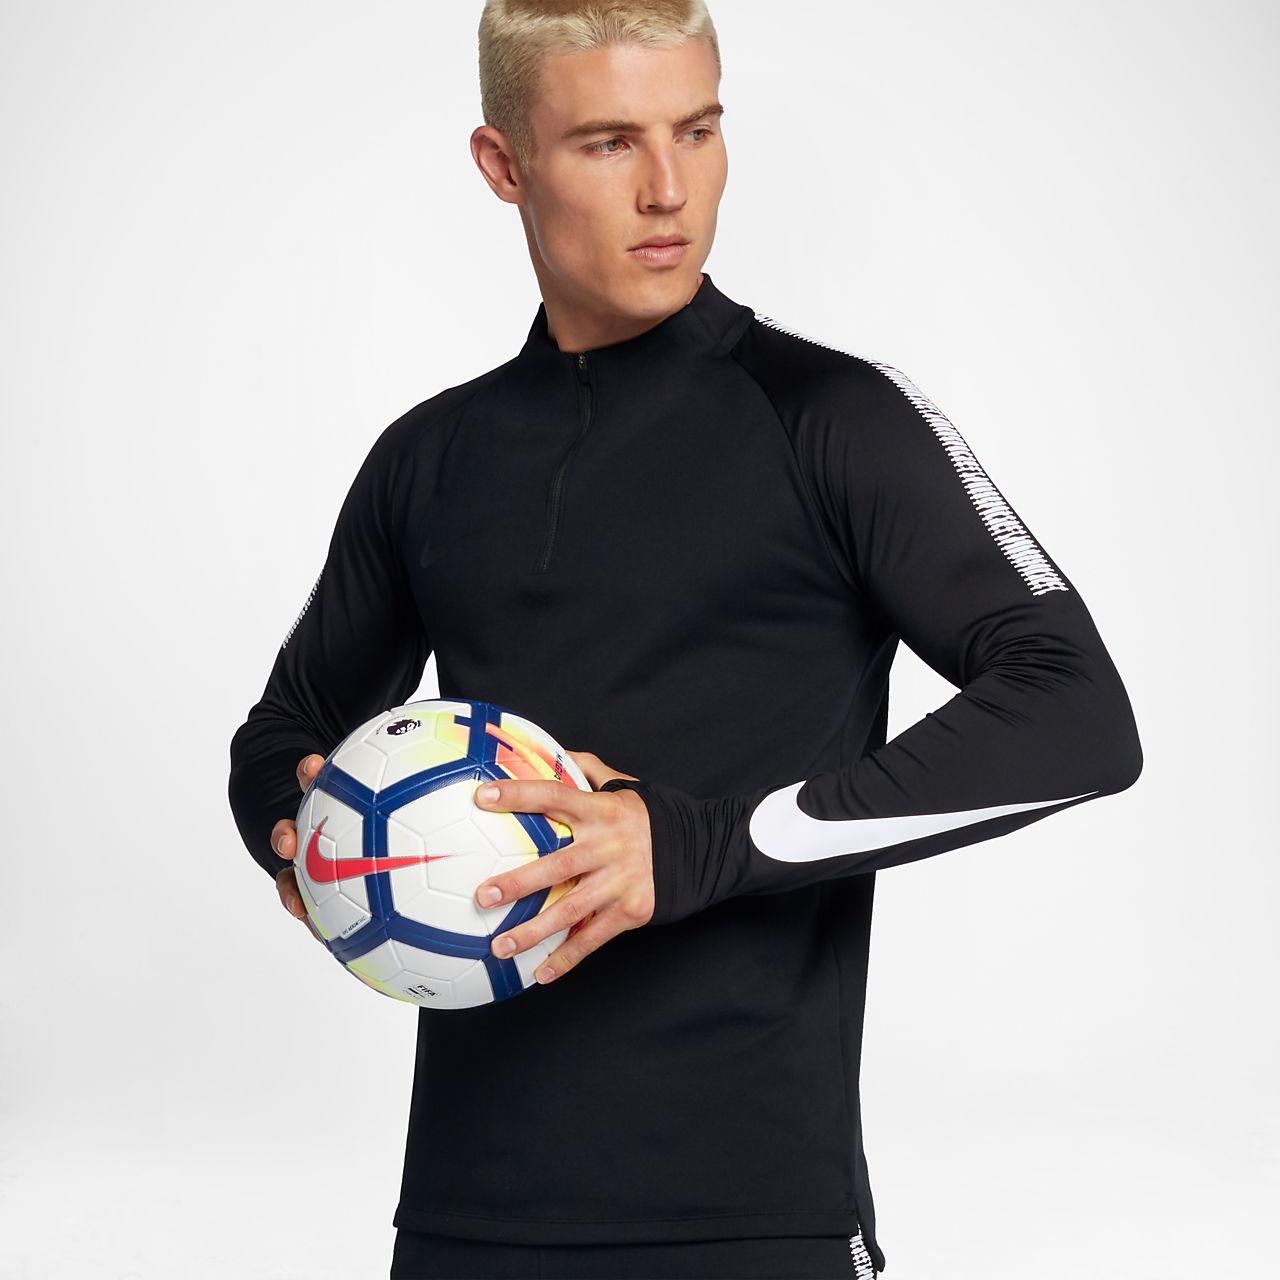 Nike - Football Training Squad Dry Drill - Top - Noir 859197-010 - NoirNIKE SPORTWEAR Em48rxvtW